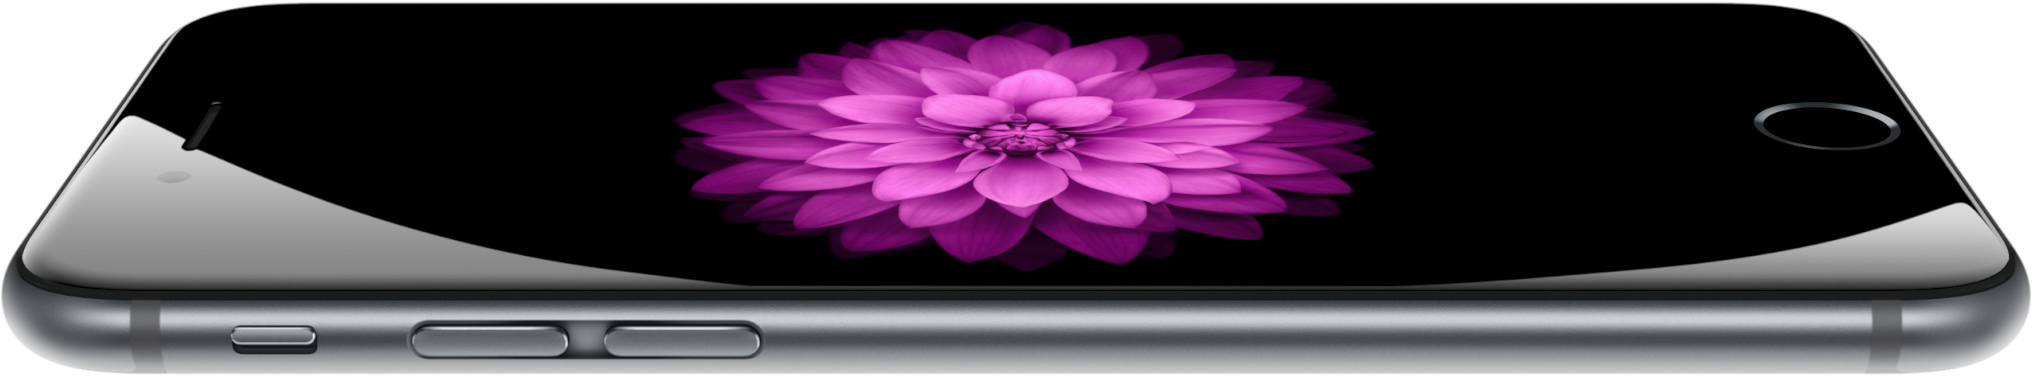 iPhone 6 deitado